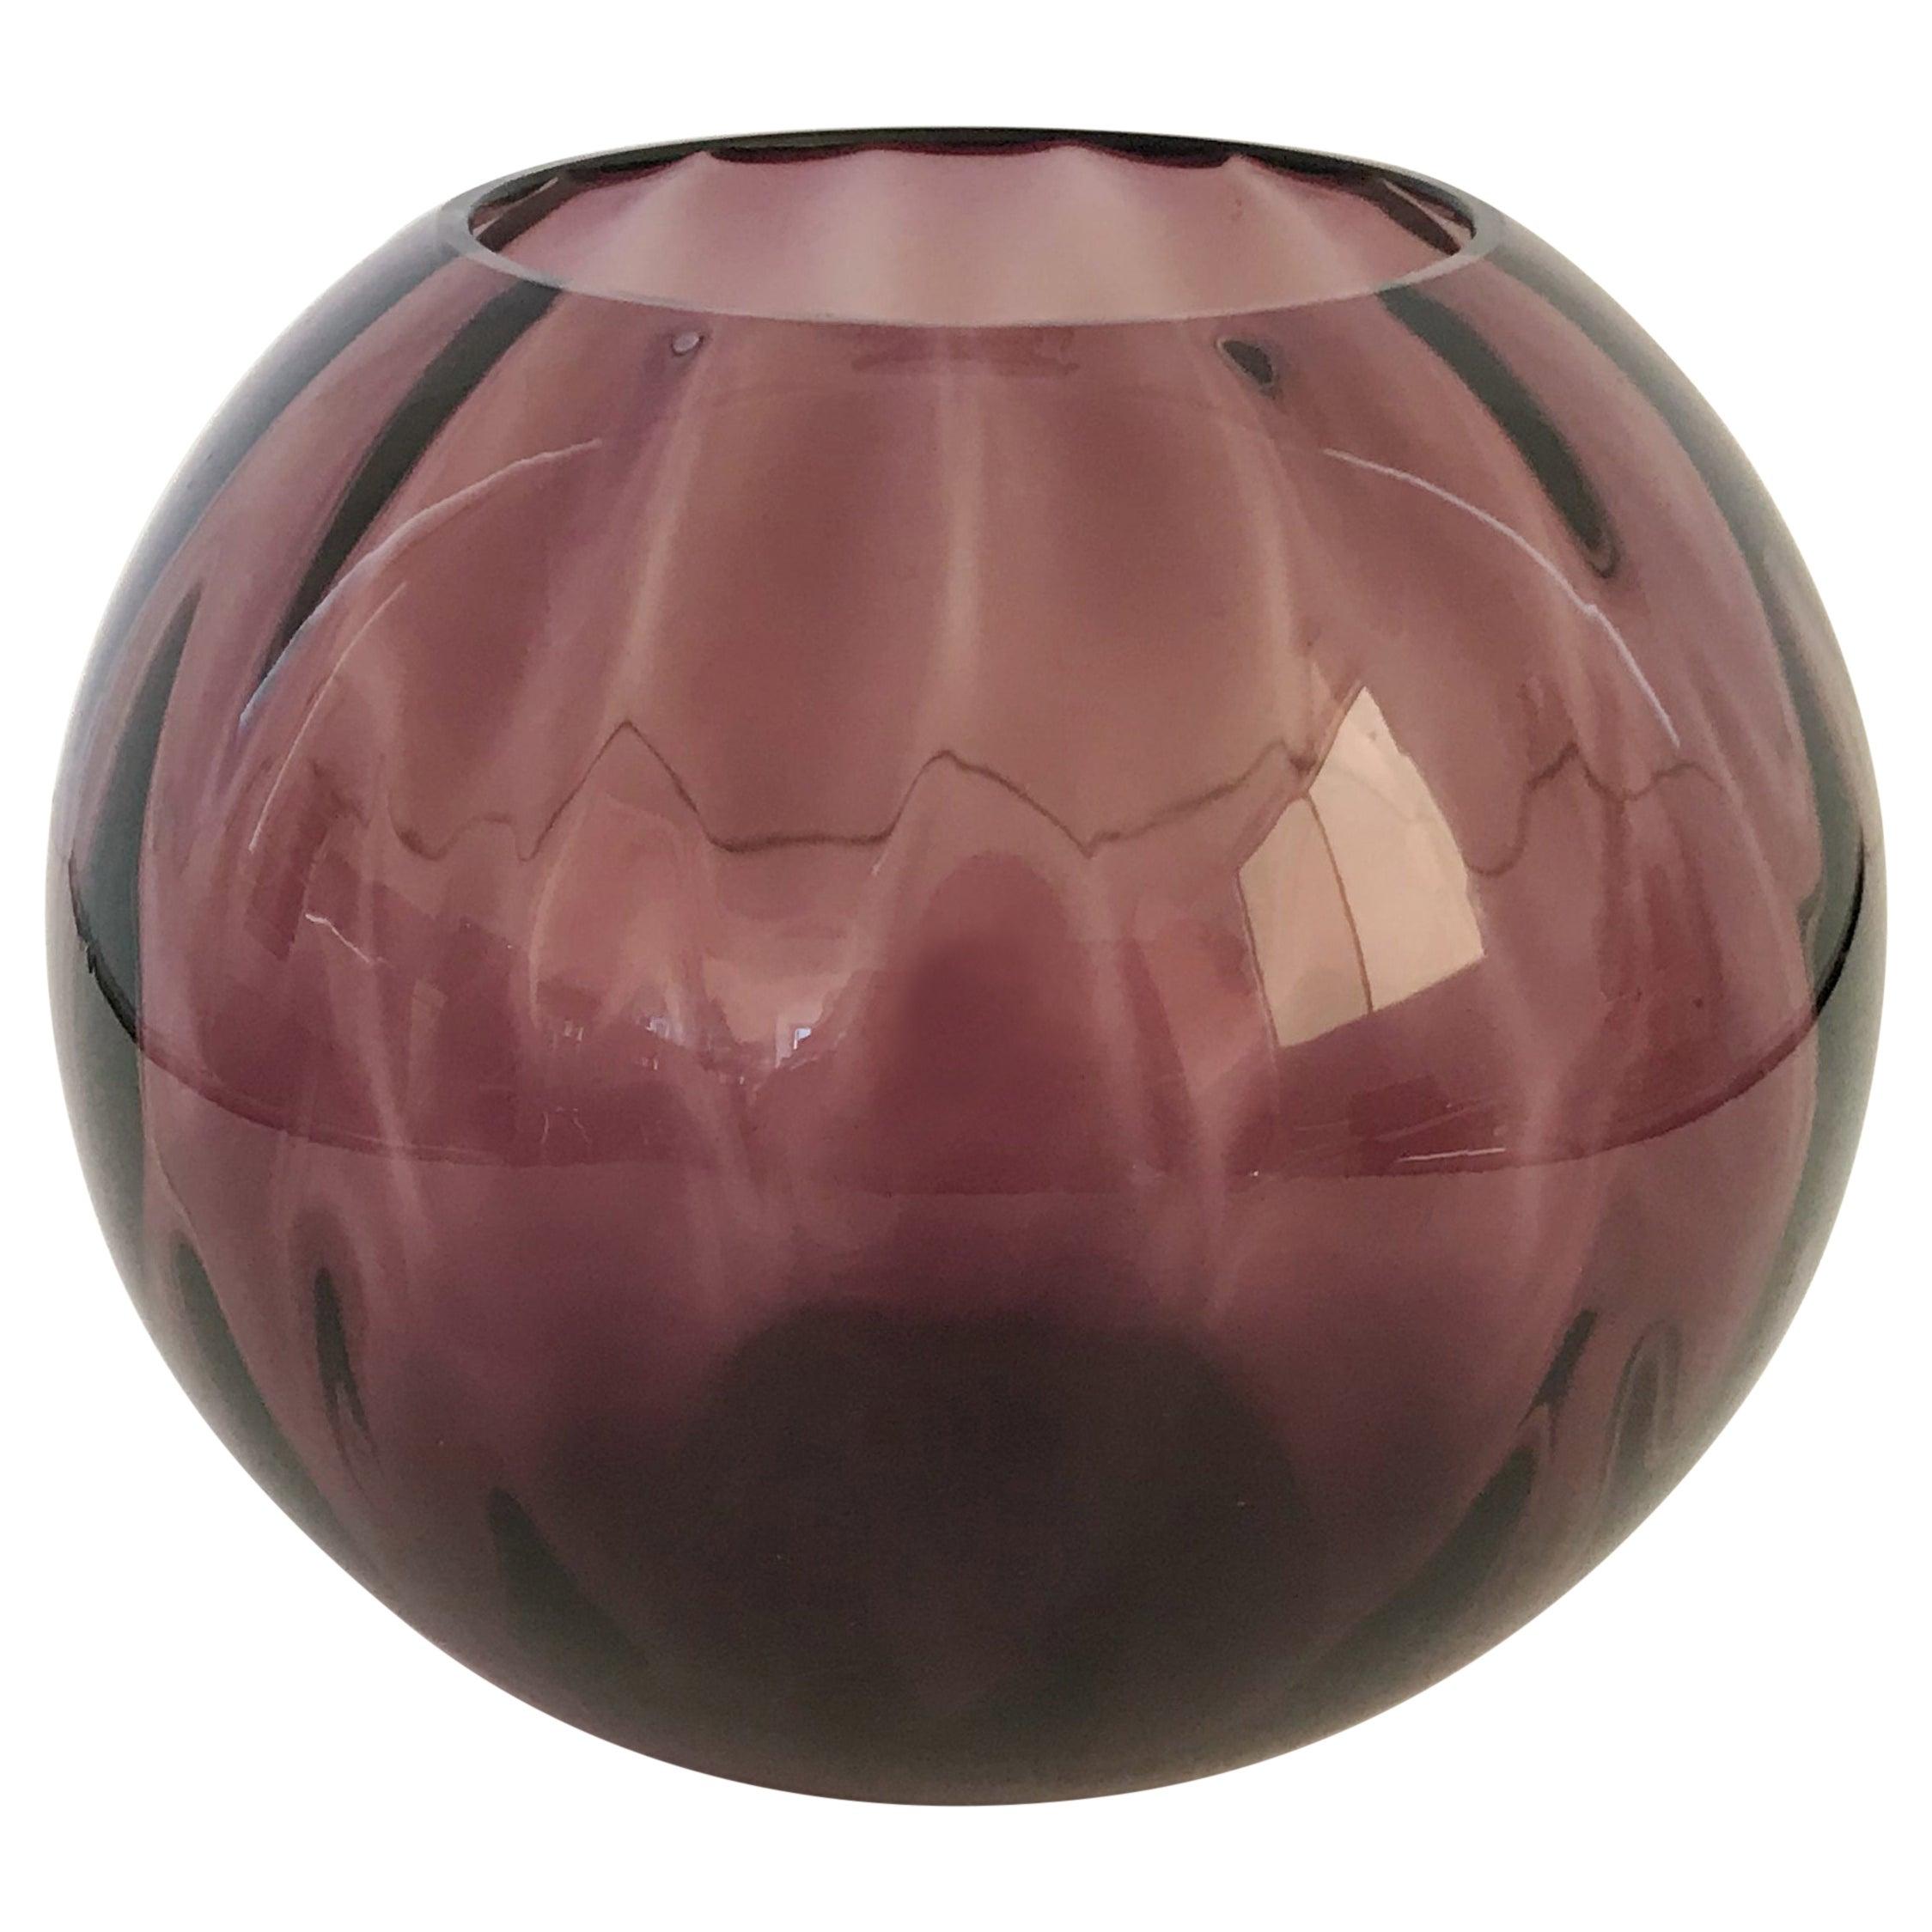 Amethyst Murano Bowl FINAL CLEARANCE SALE